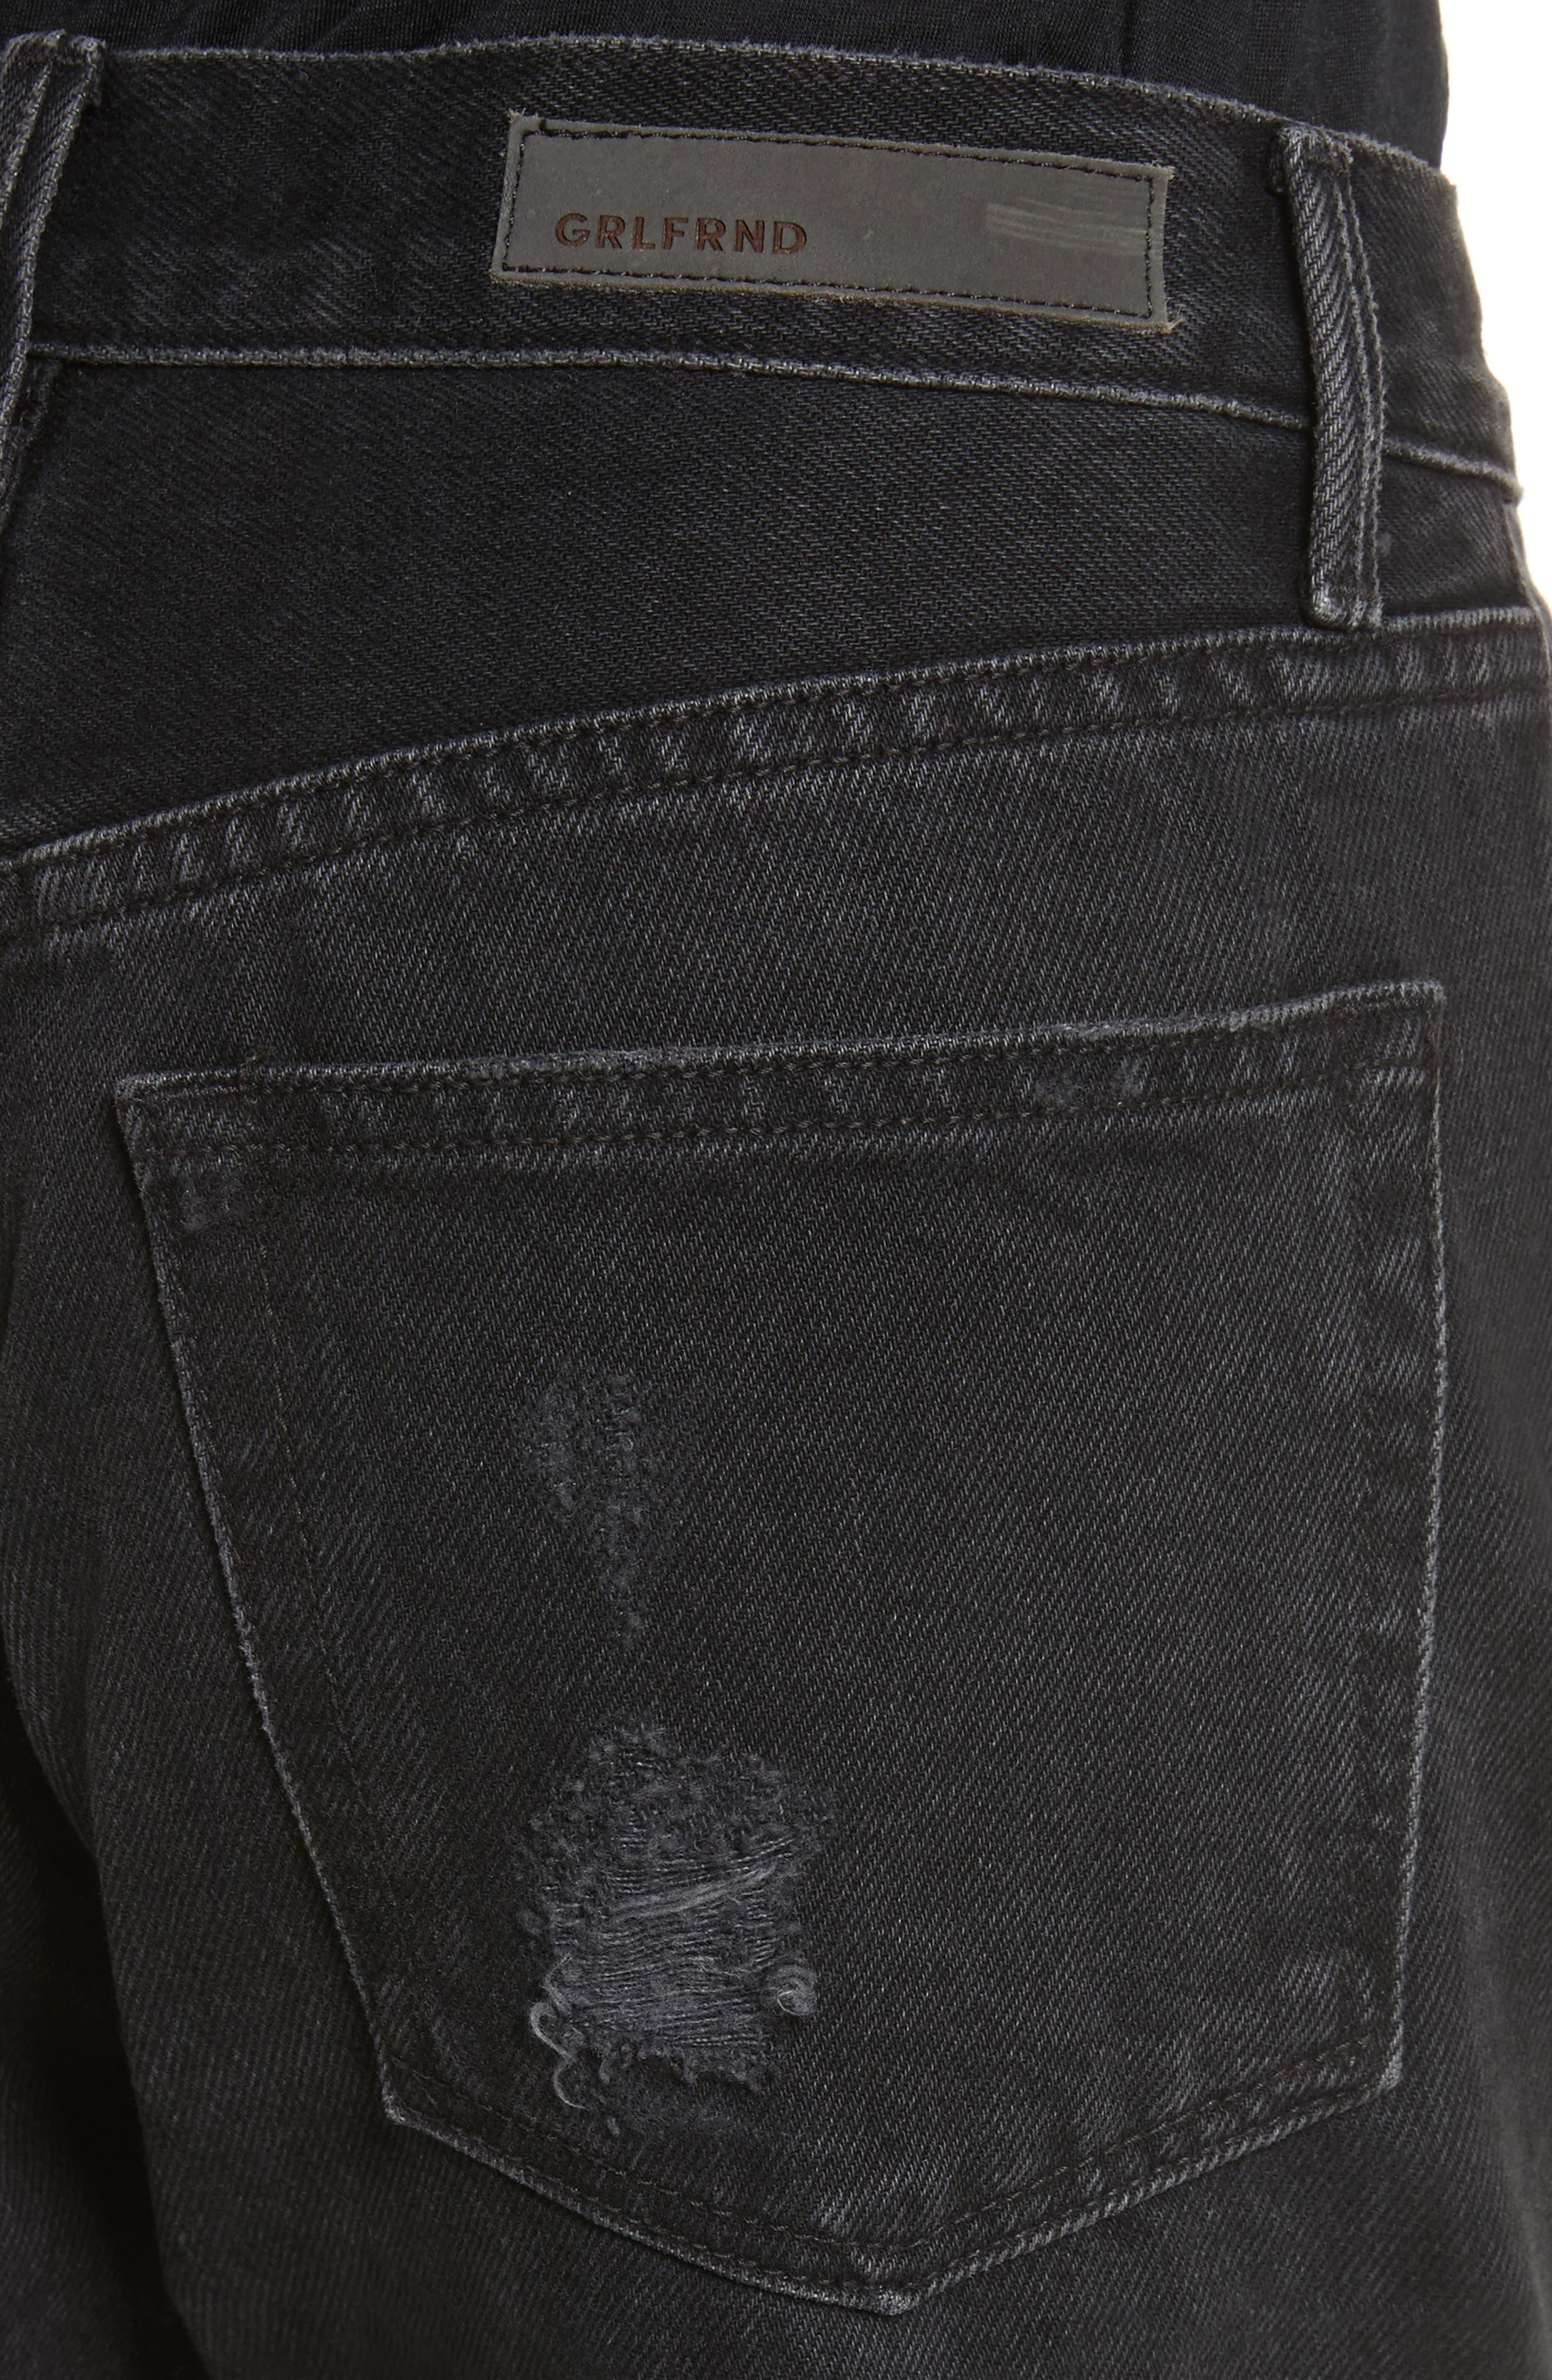 Karolina Ripped Rigid High Waist Skinny Jeans,                             Alternate thumbnail 4, color,                             TRAVELIN BAND